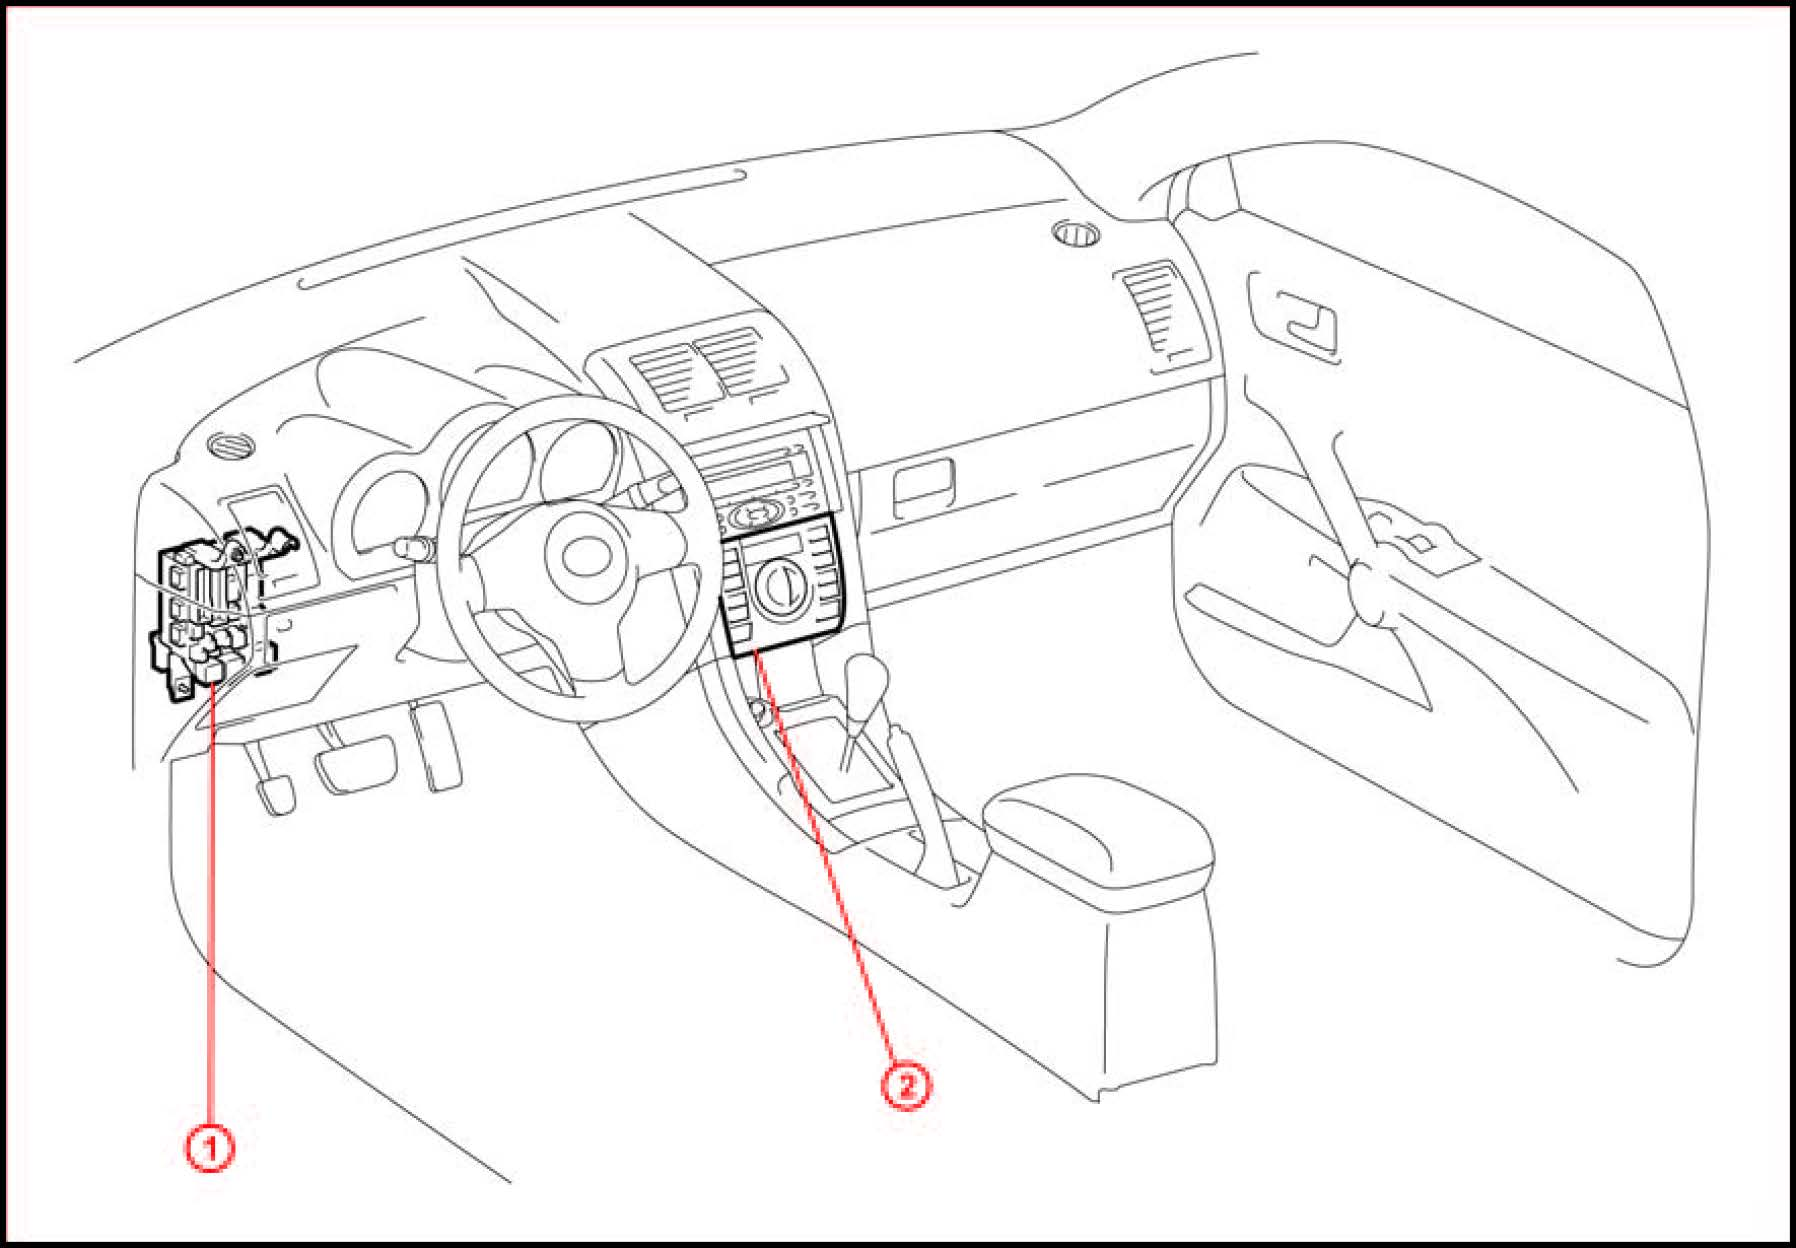 2001 oldsmobile silhouette engine diagram 1965 mustang wiring diagrams electrical schematics repair manual